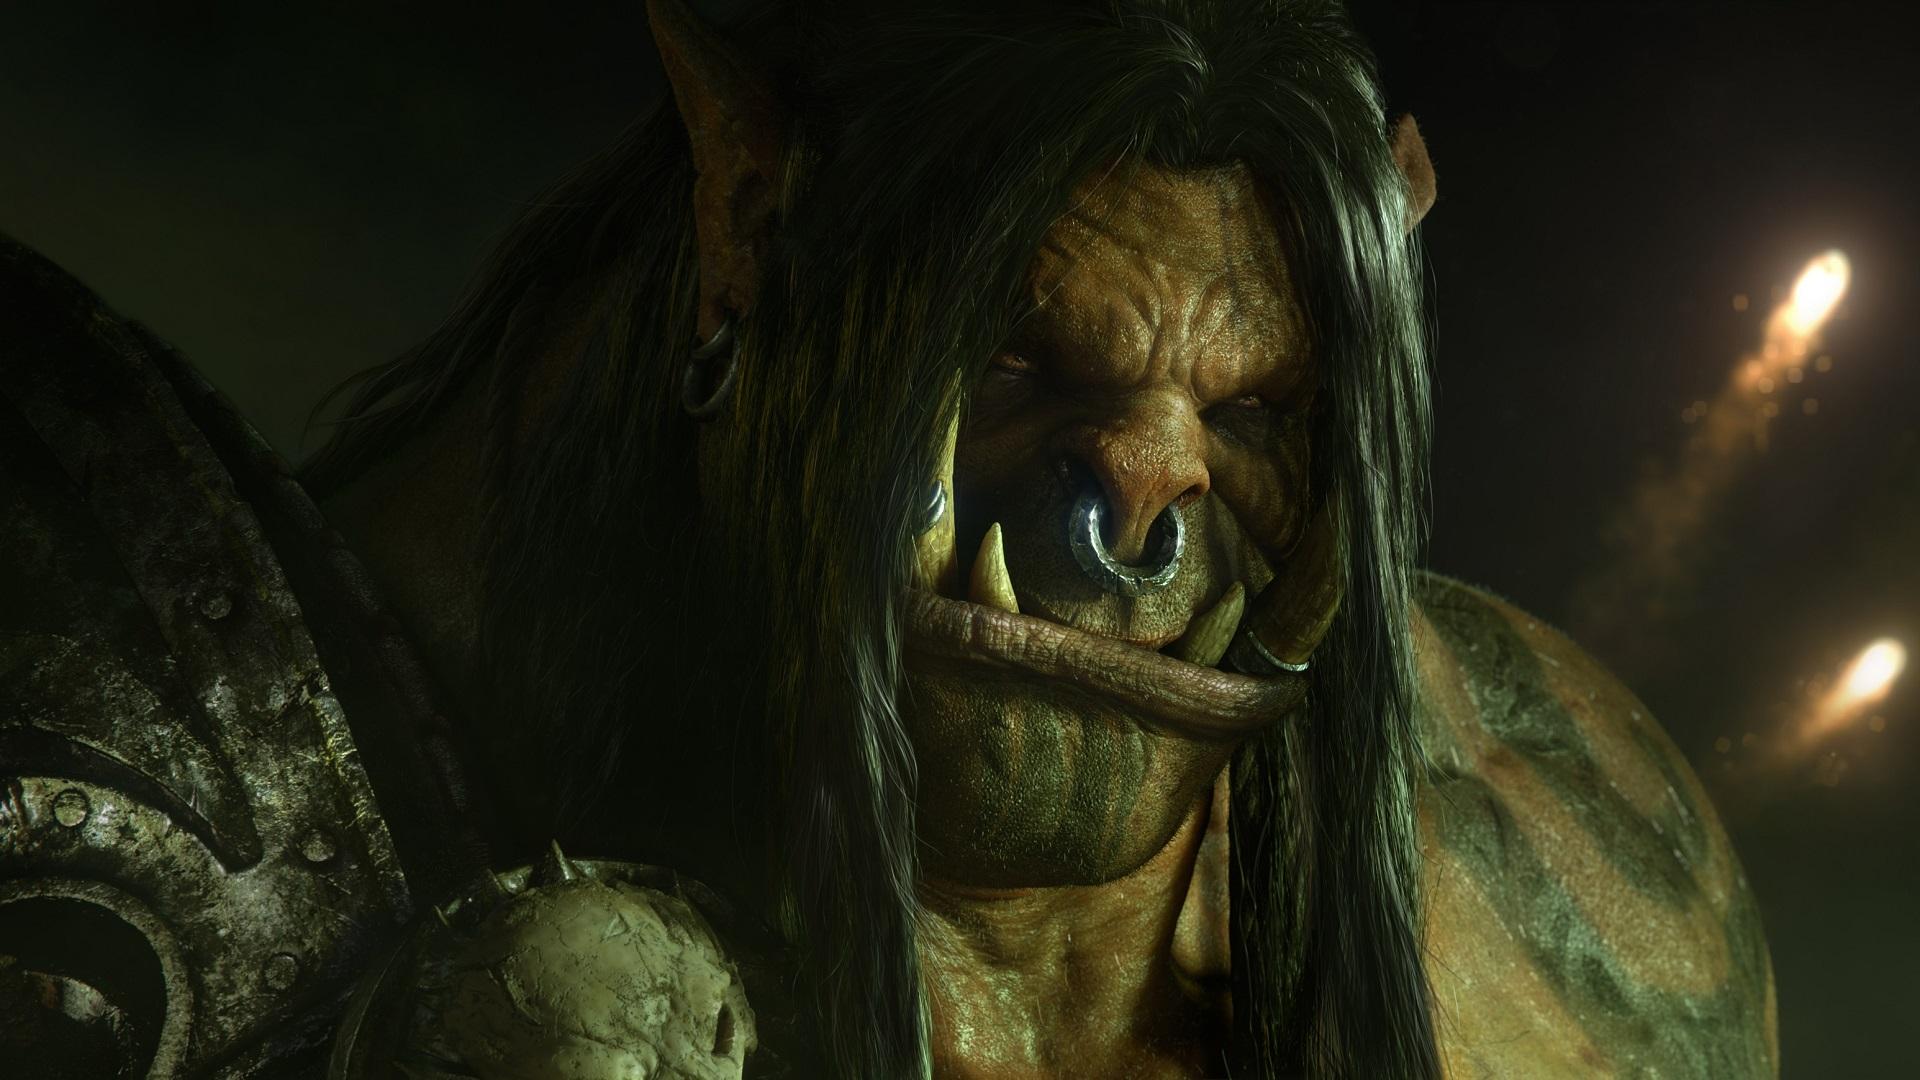 Fondos De Pantalla Videojuegos Mundo De Warcraft Orcos Orco